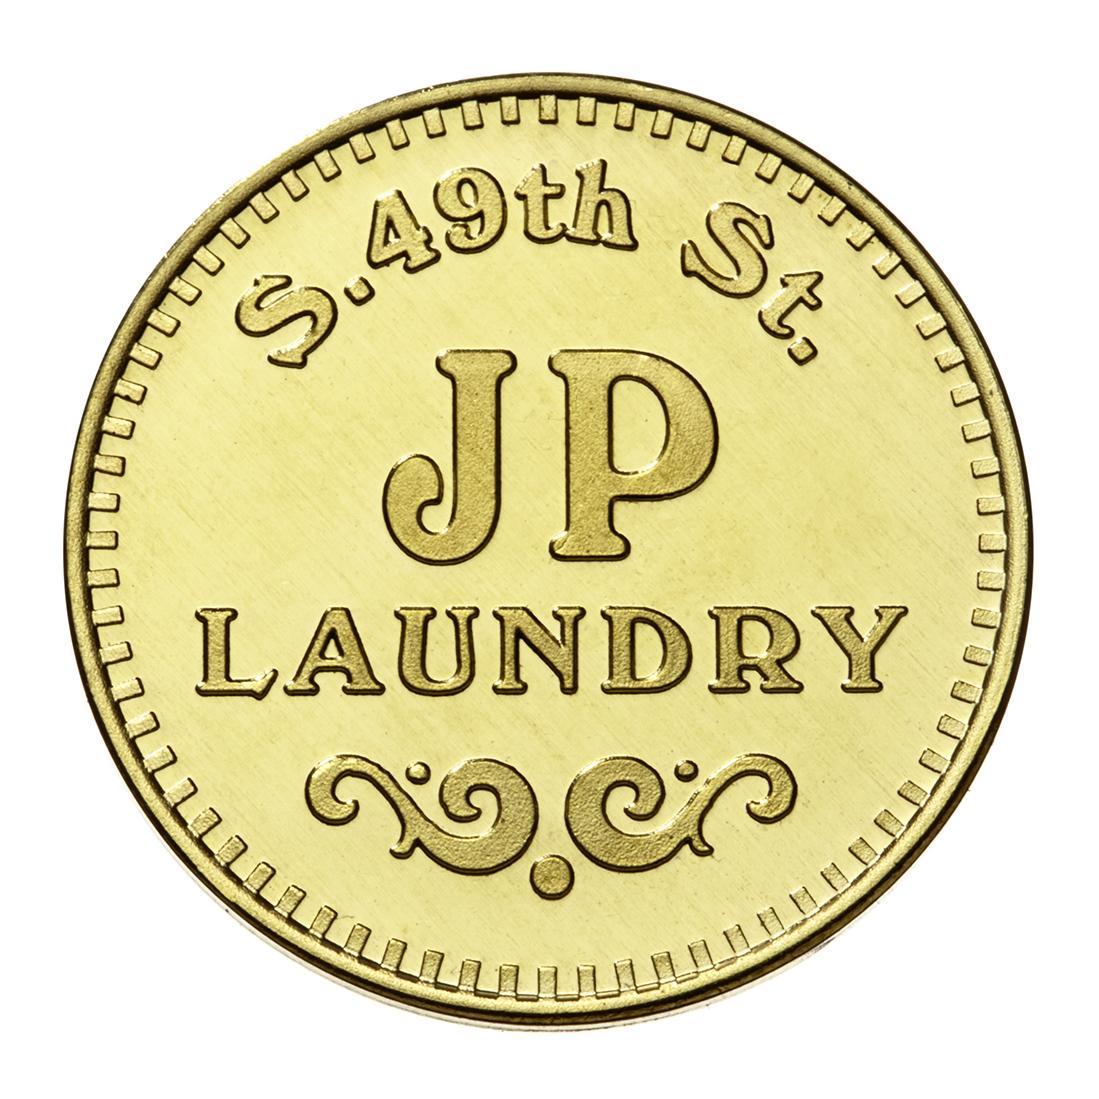 J.P. Laundry